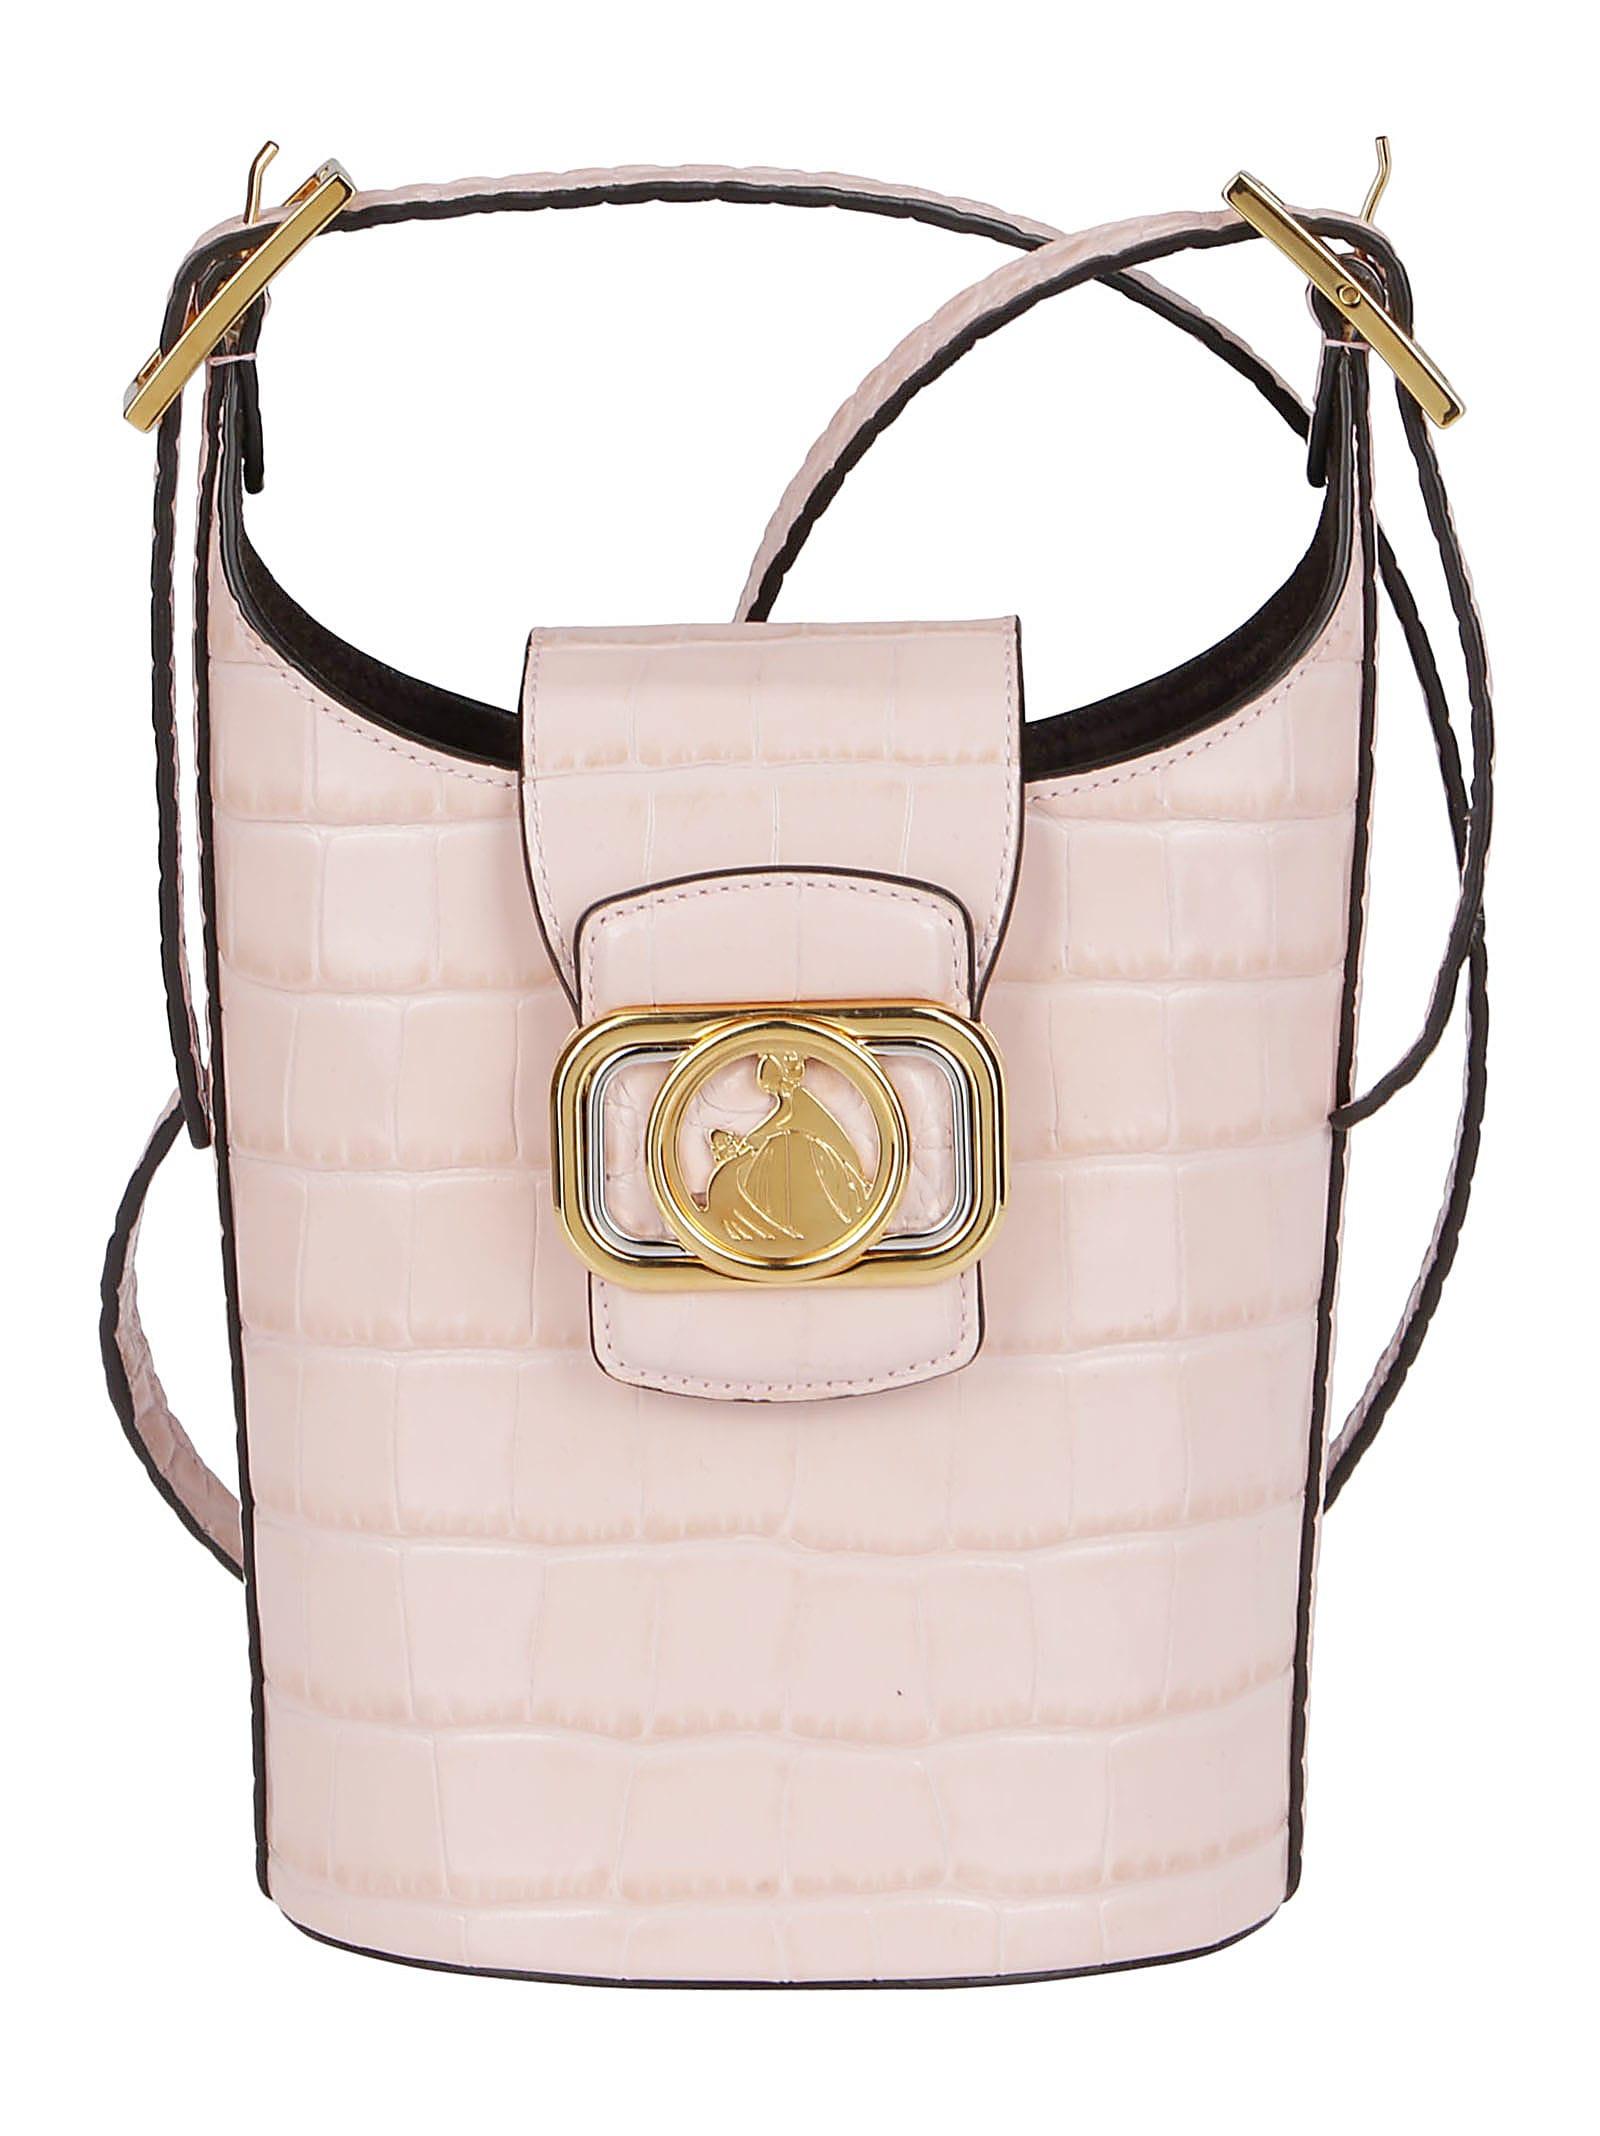 Lanvin PINK LEATHER SWAN BUCKET BAG